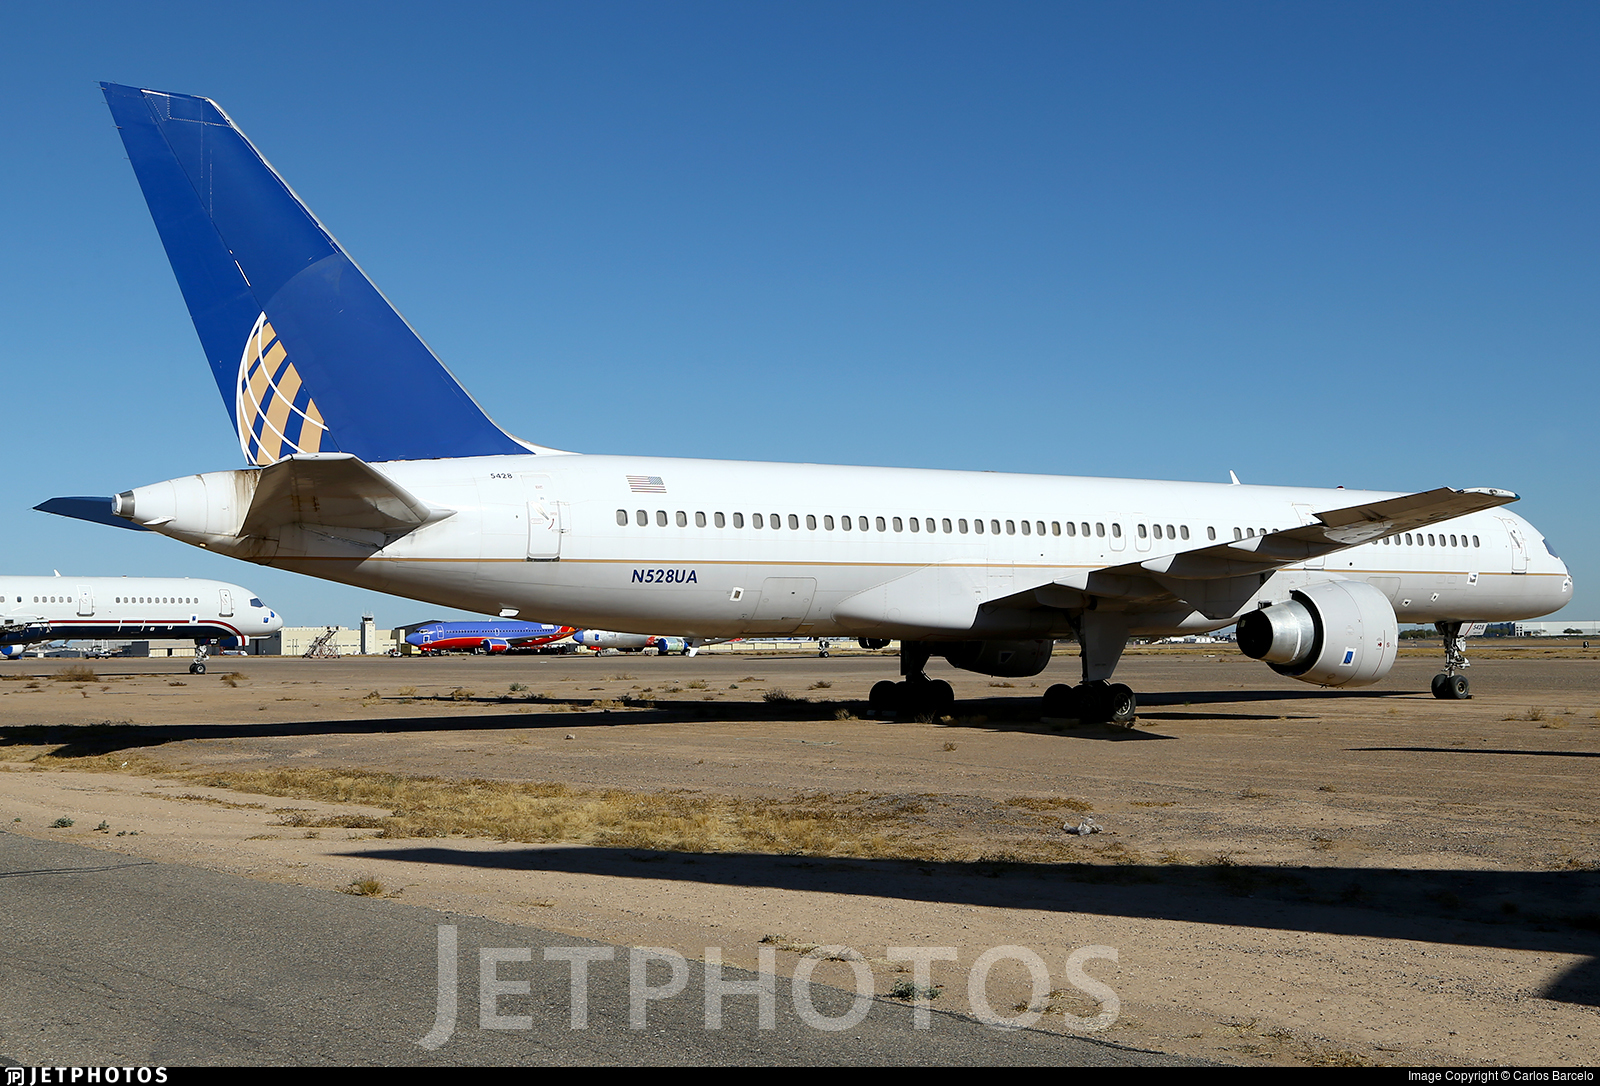 N528UA - Boeing 757-222 - Untitled